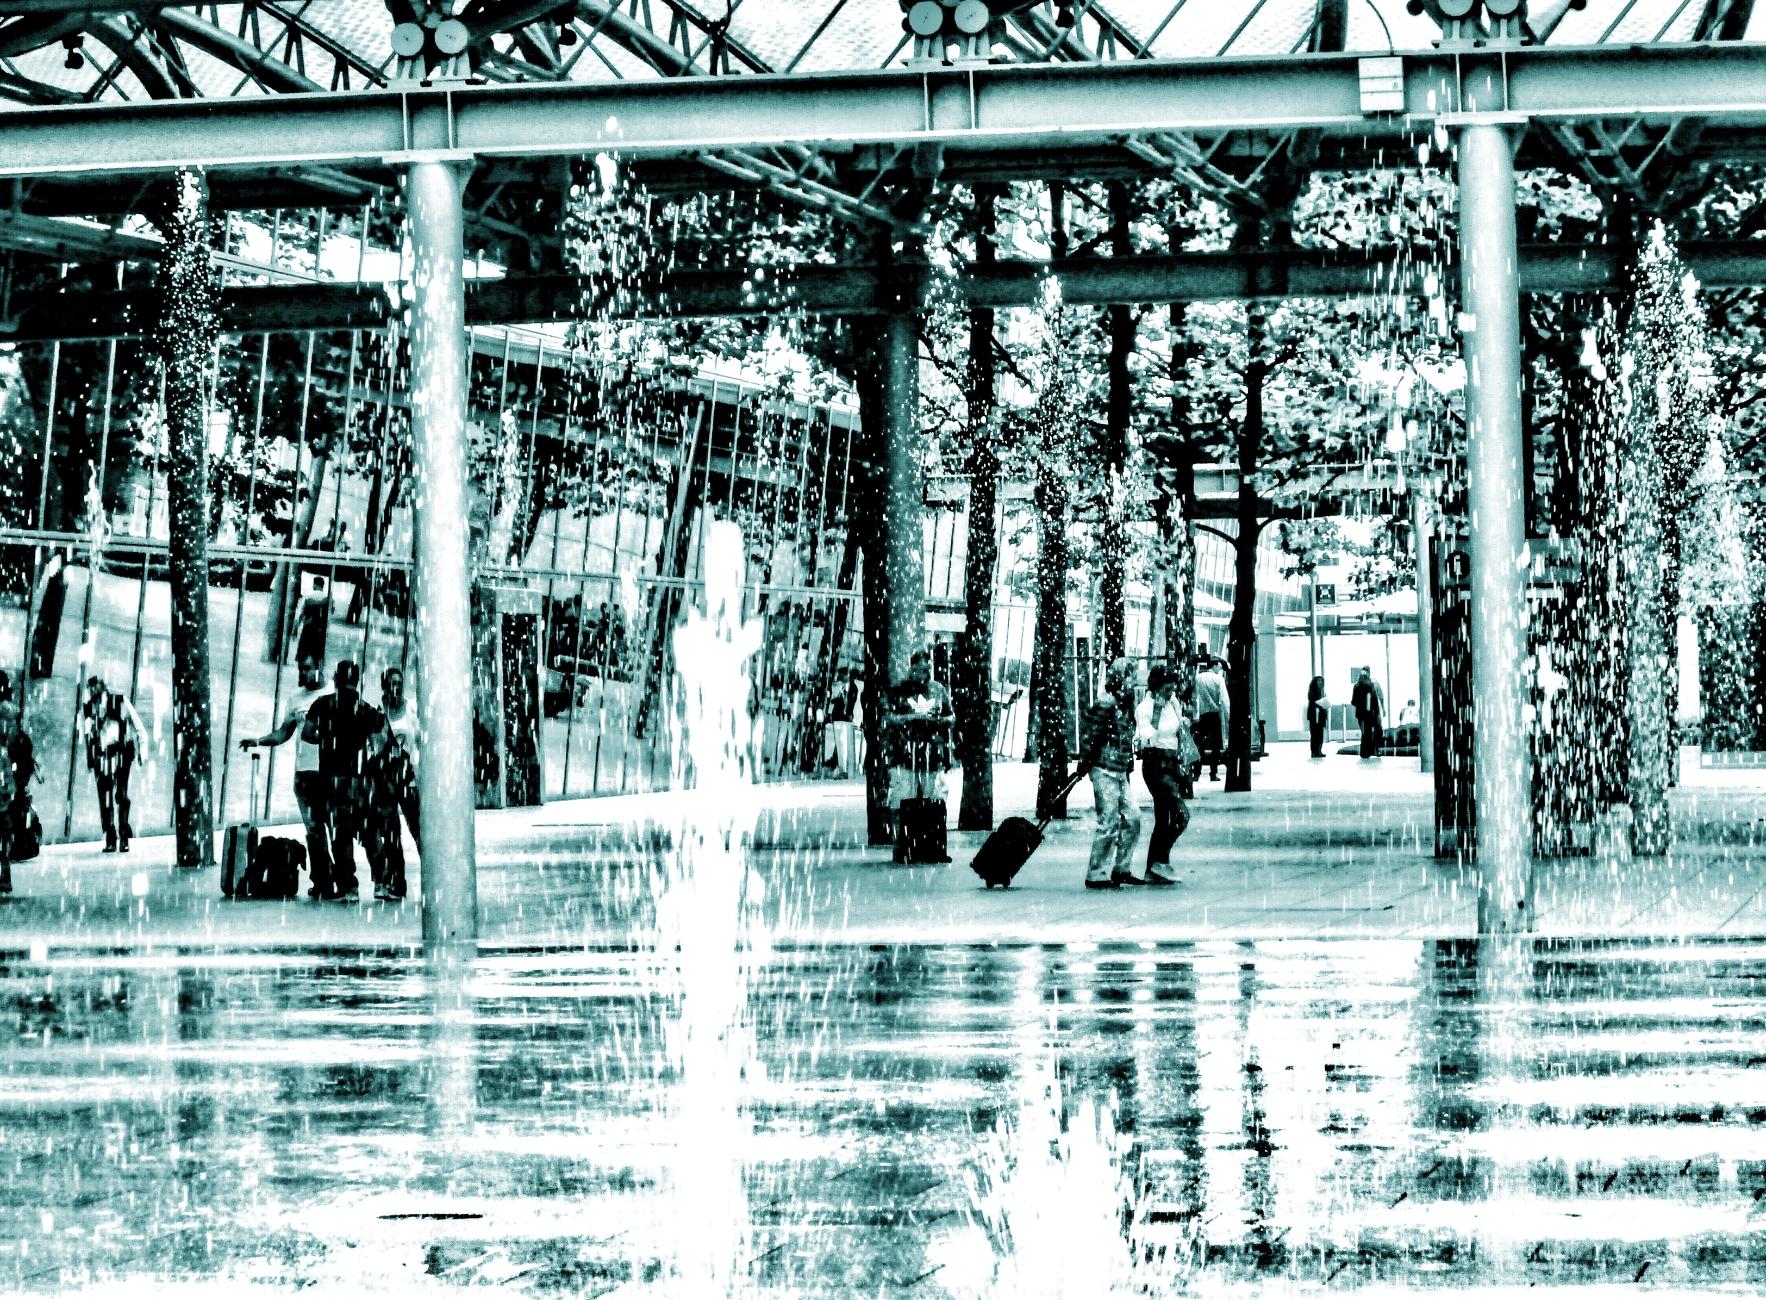 Fountain fury